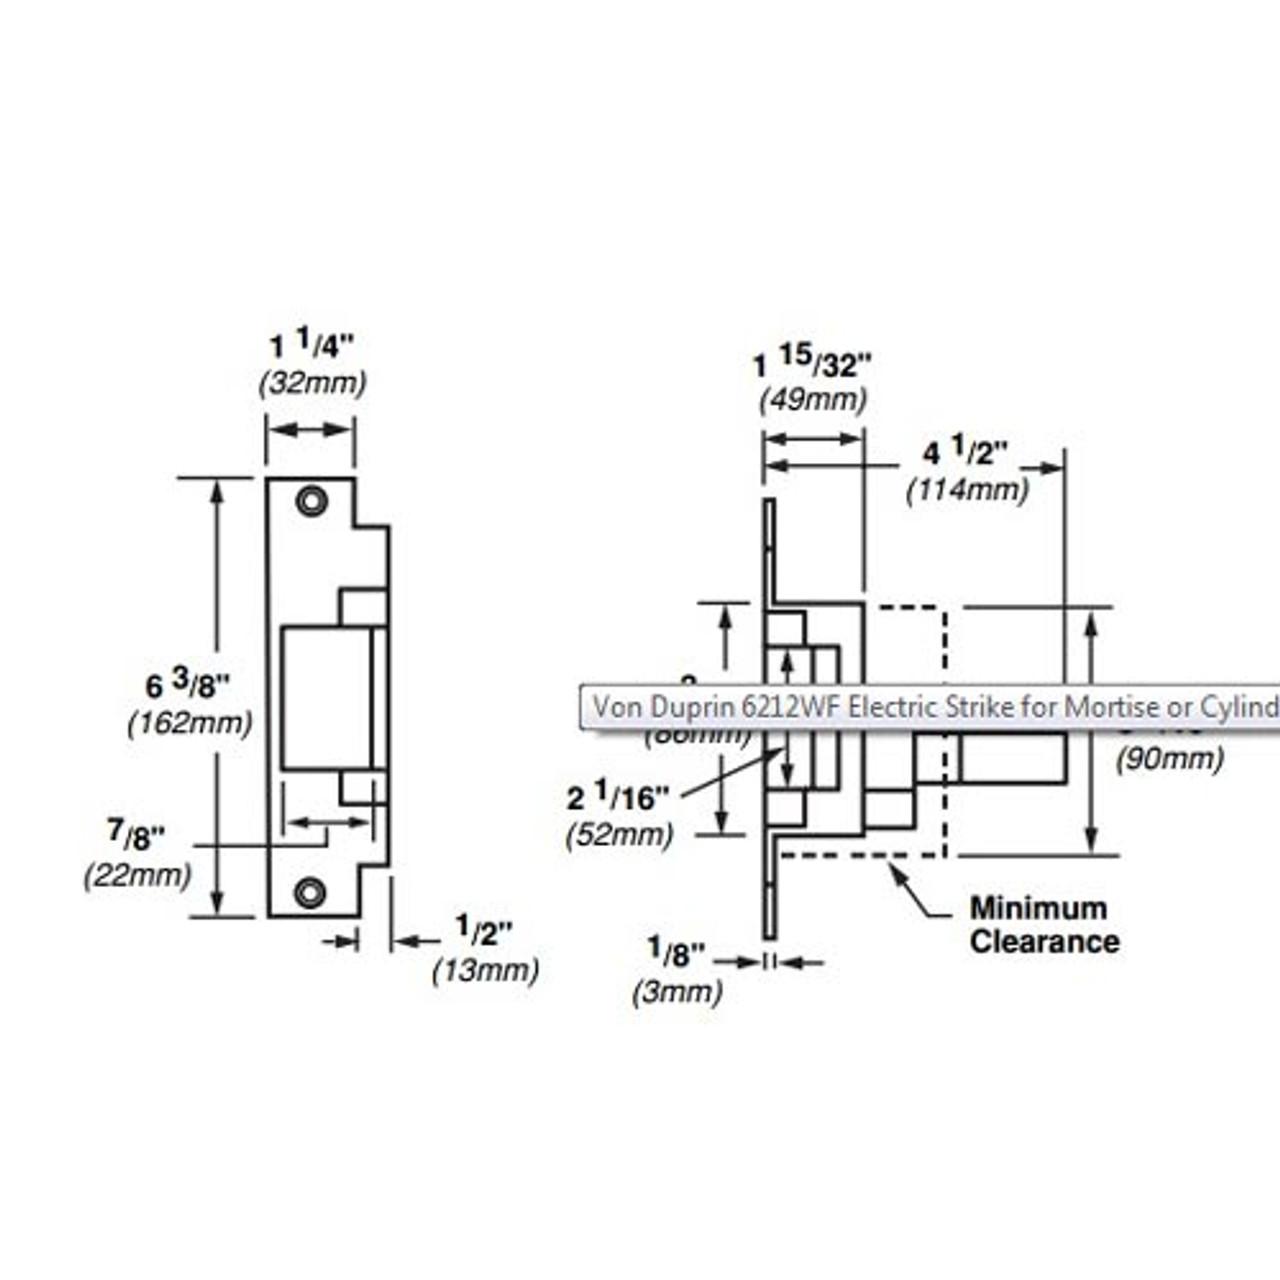 6212WF-12VDC-US4 Von Duprin Electric Strike for Mortise or Cylindrical Locksets in Satin Brass Finish